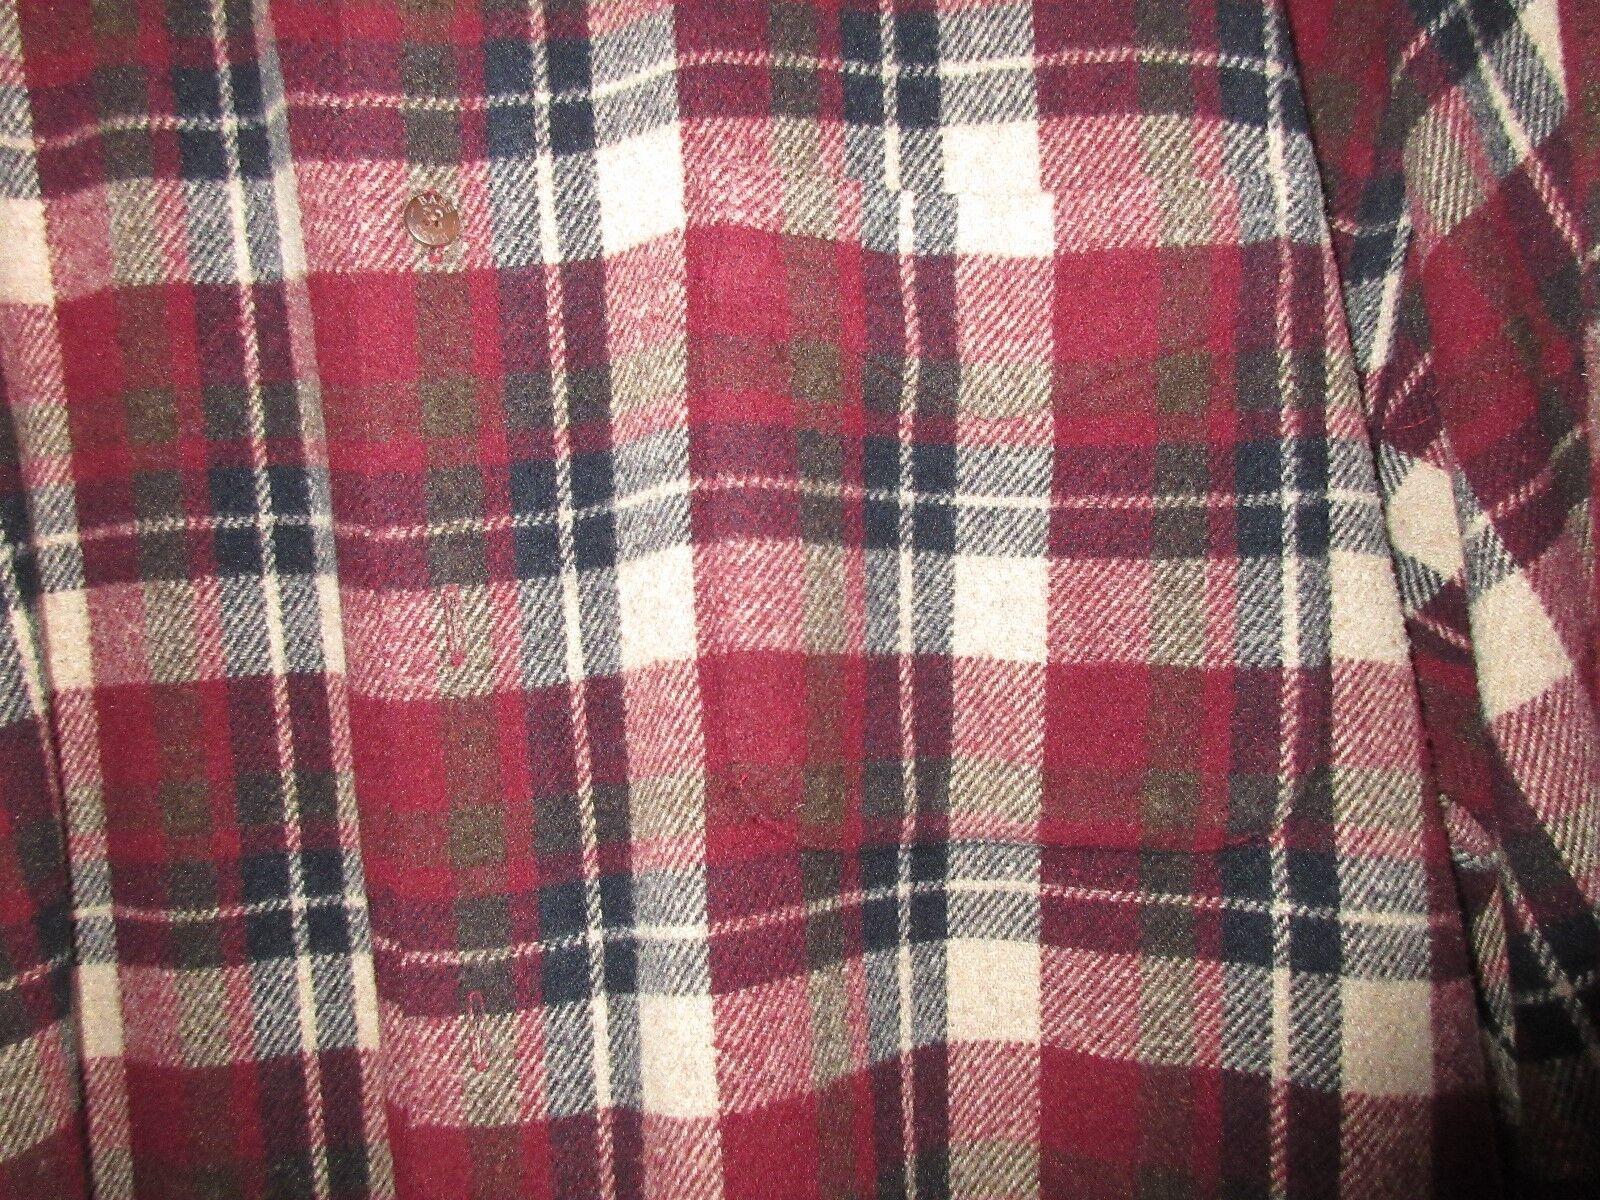 G.H. Bass & Co. , Shirt/Jacket ,Vintage , Cranberry Pla